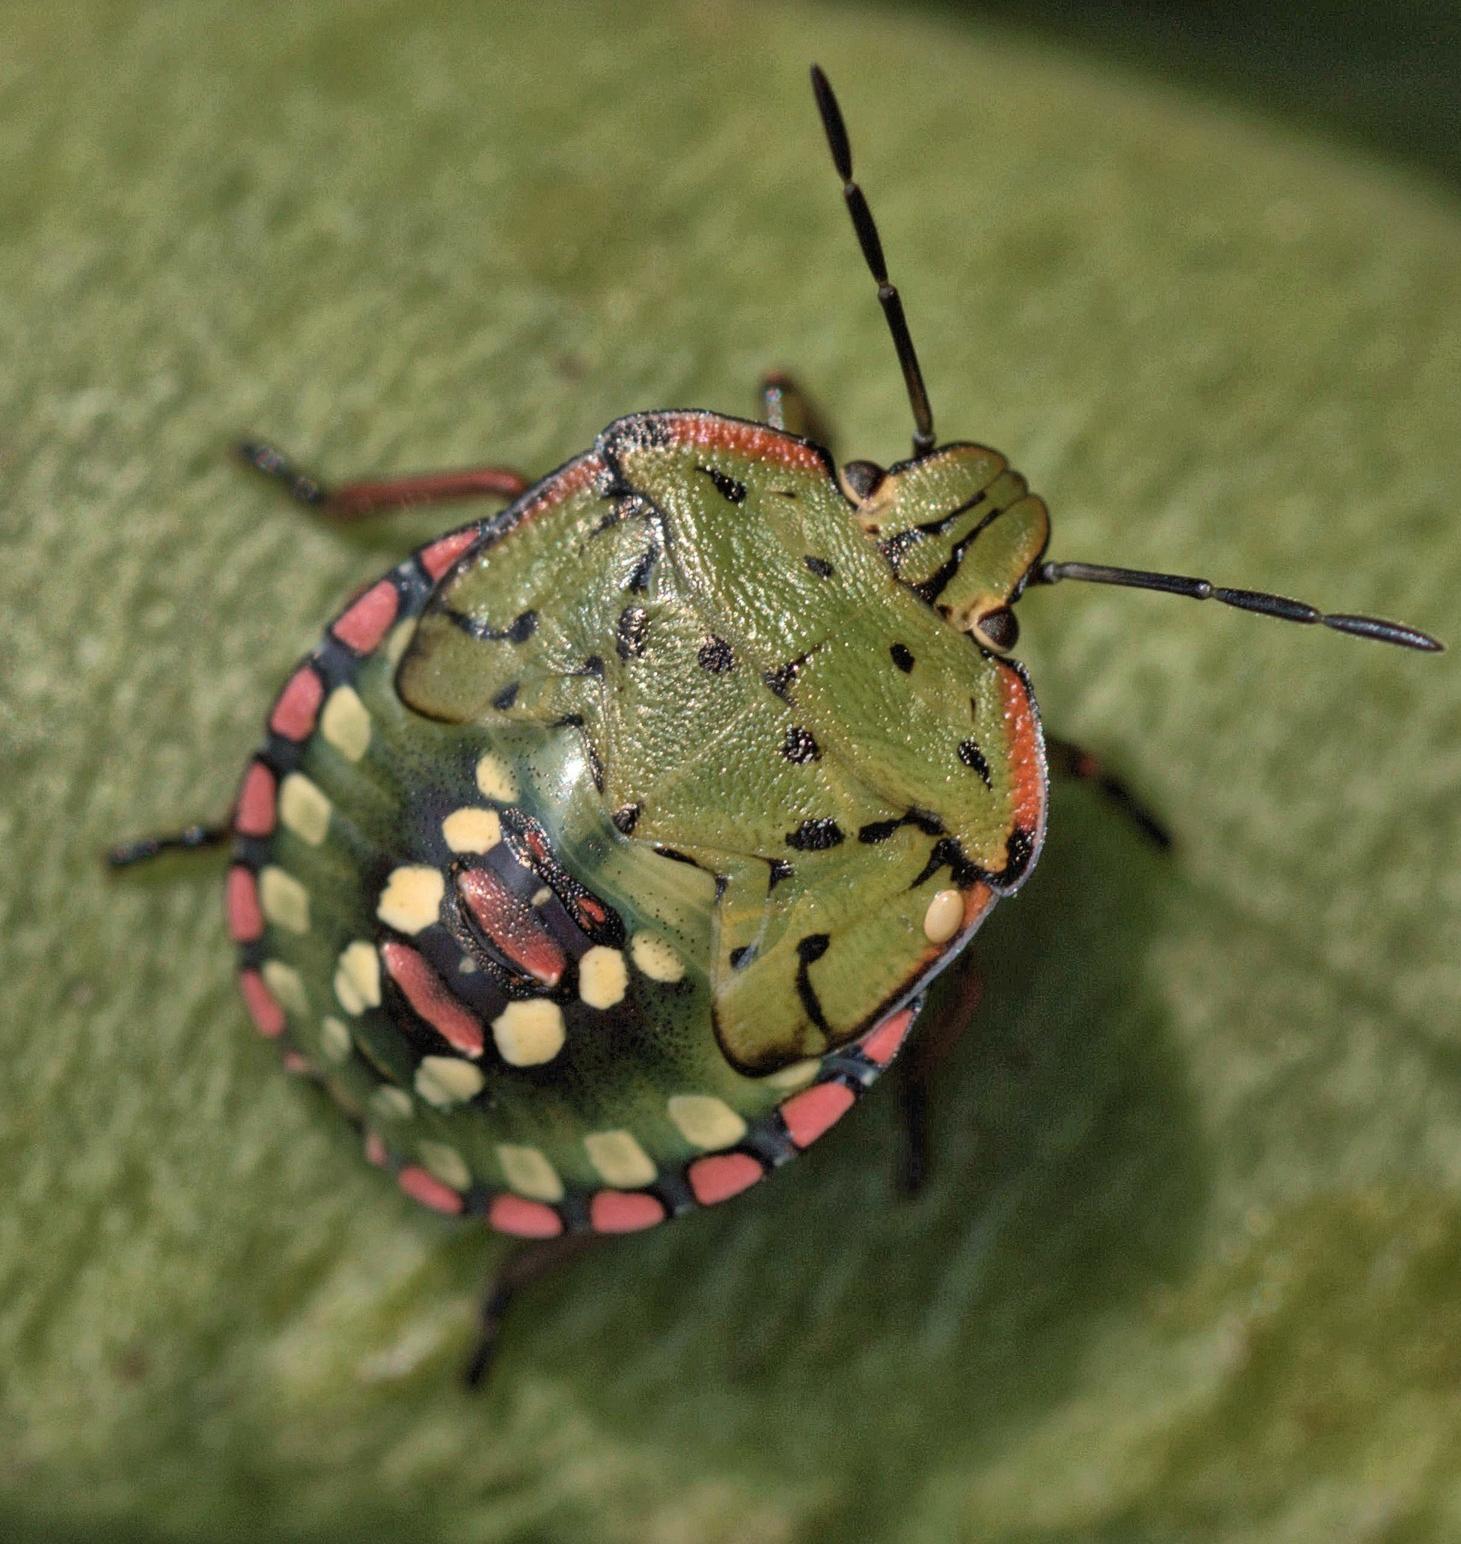 5th instar Southern Green Shield Bug